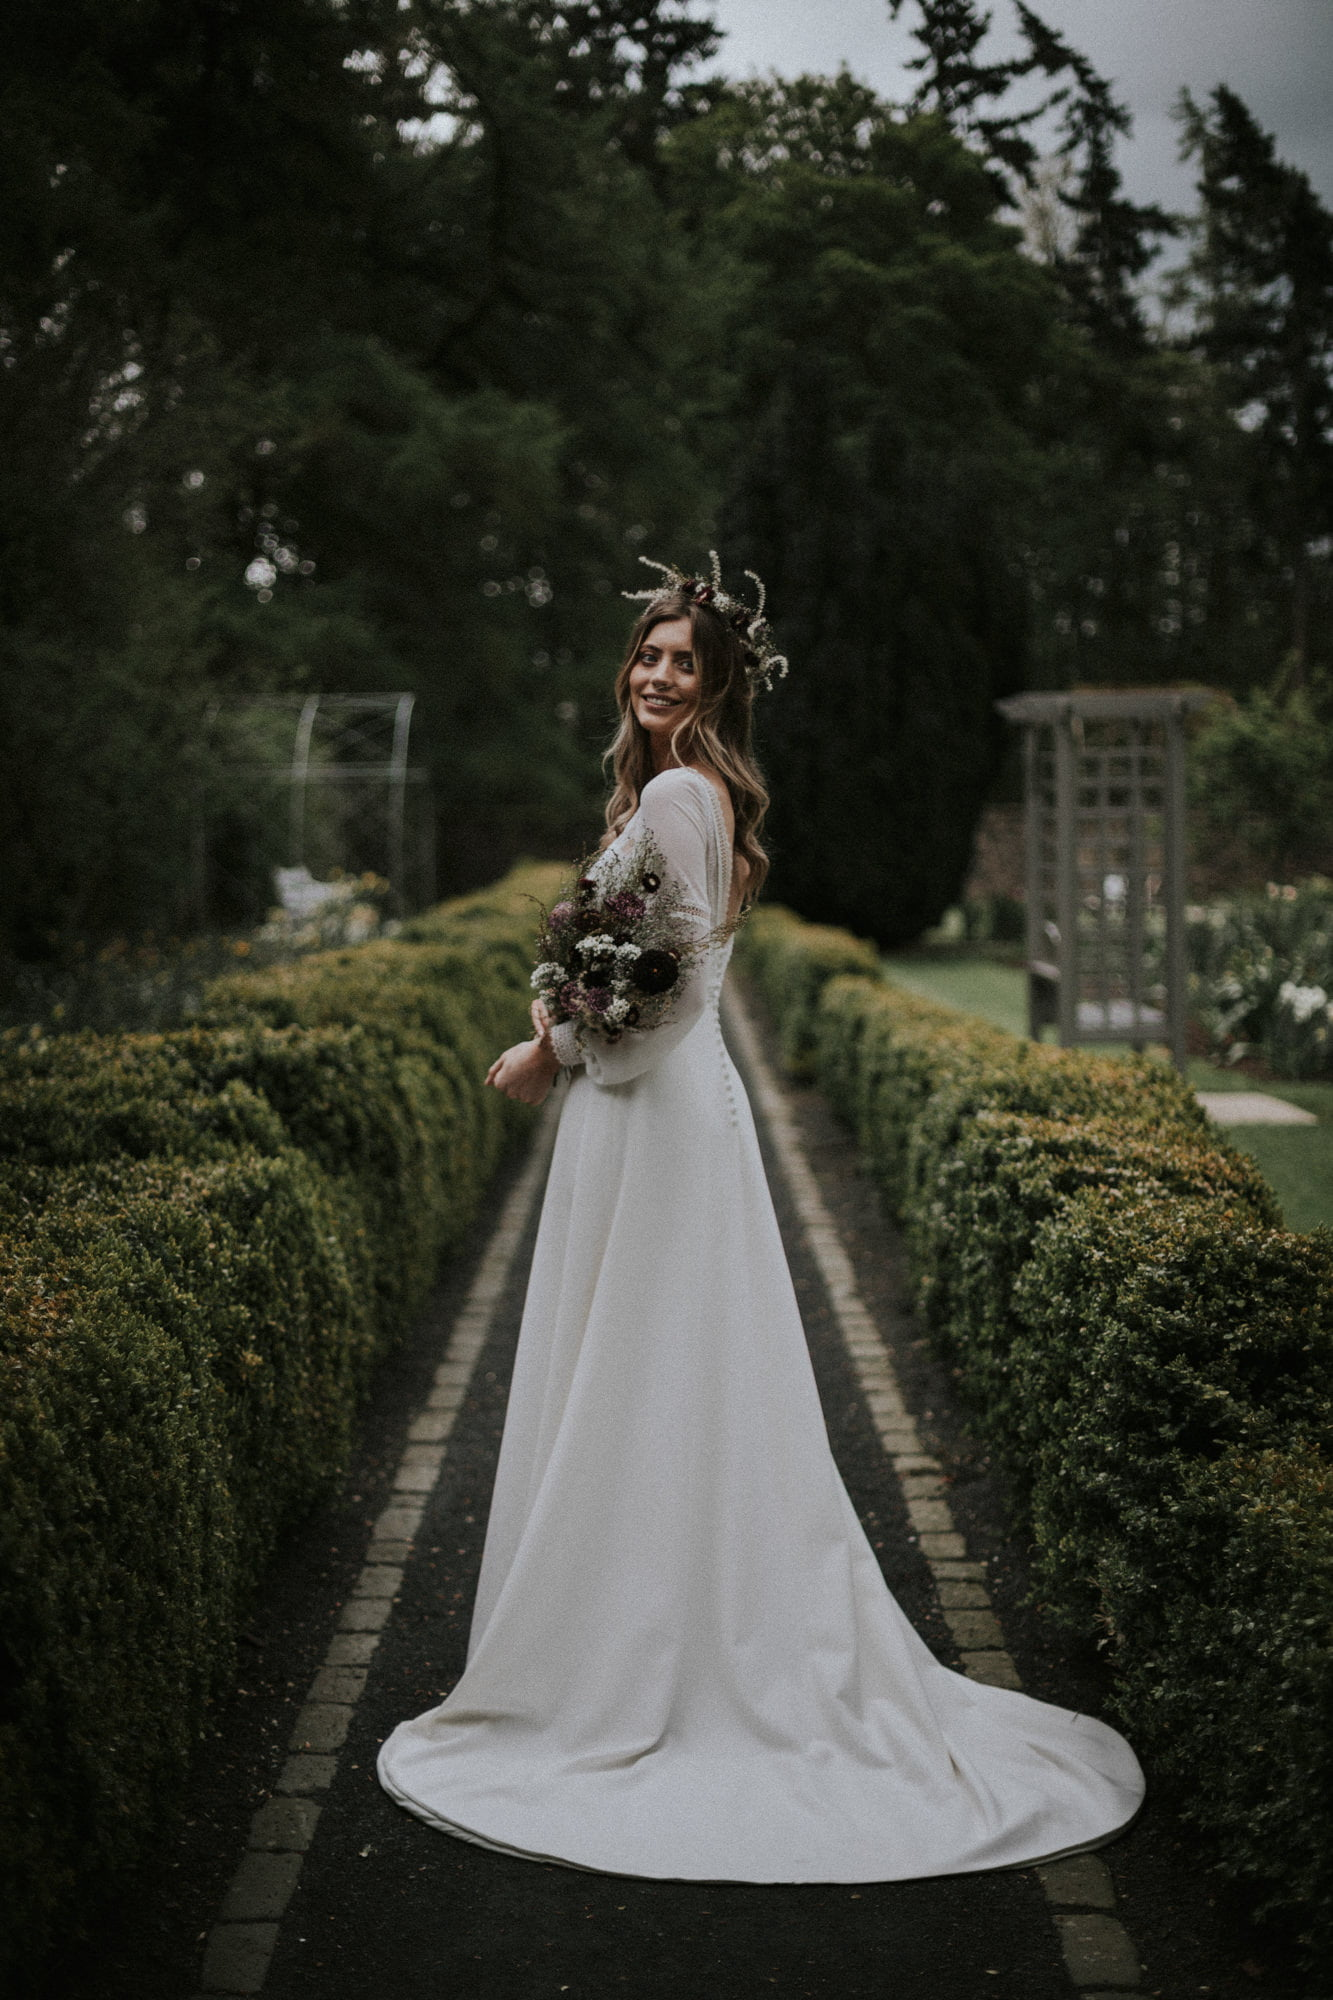 Backhouse Rossie Estate Wedding Venue in Fife, Oscar Lili - Boho Wedding Dresses, Backhouse Rossie Wedding Venue